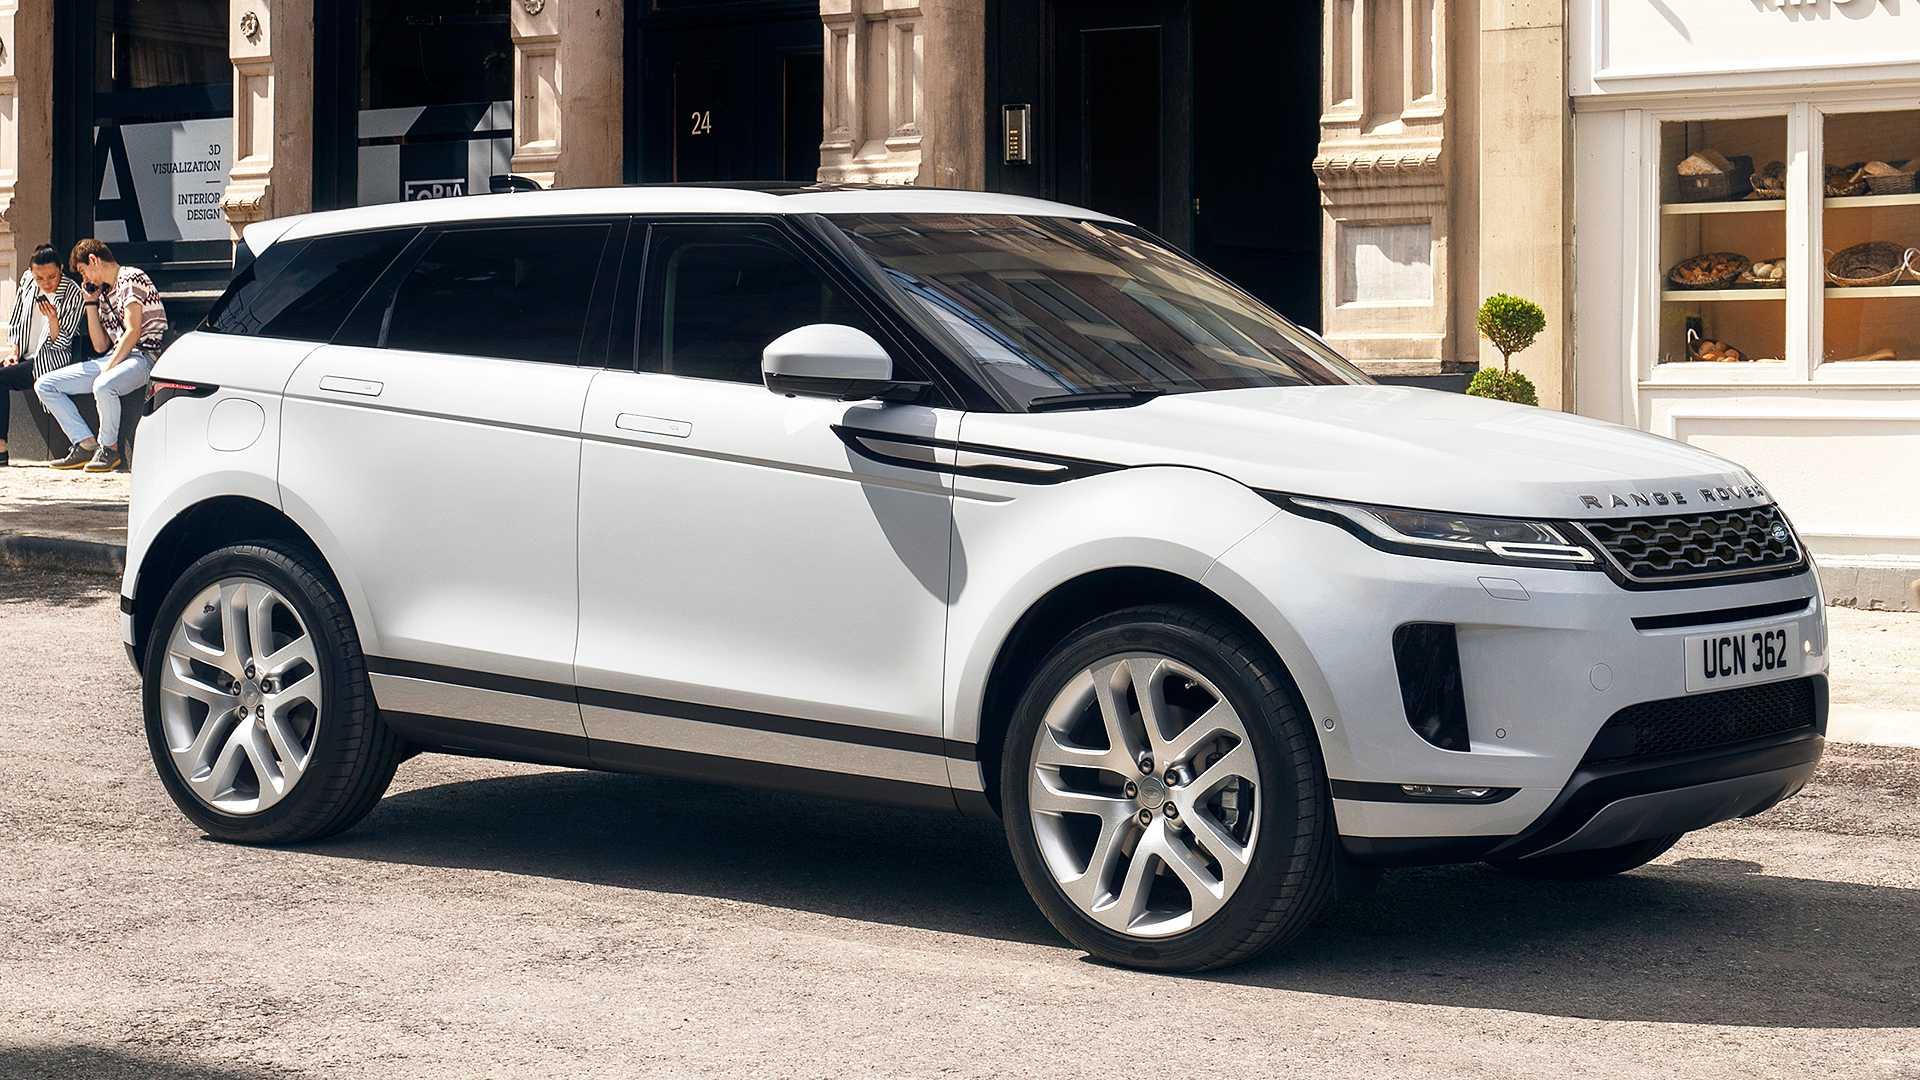 2020-range-rover-evoque (65)